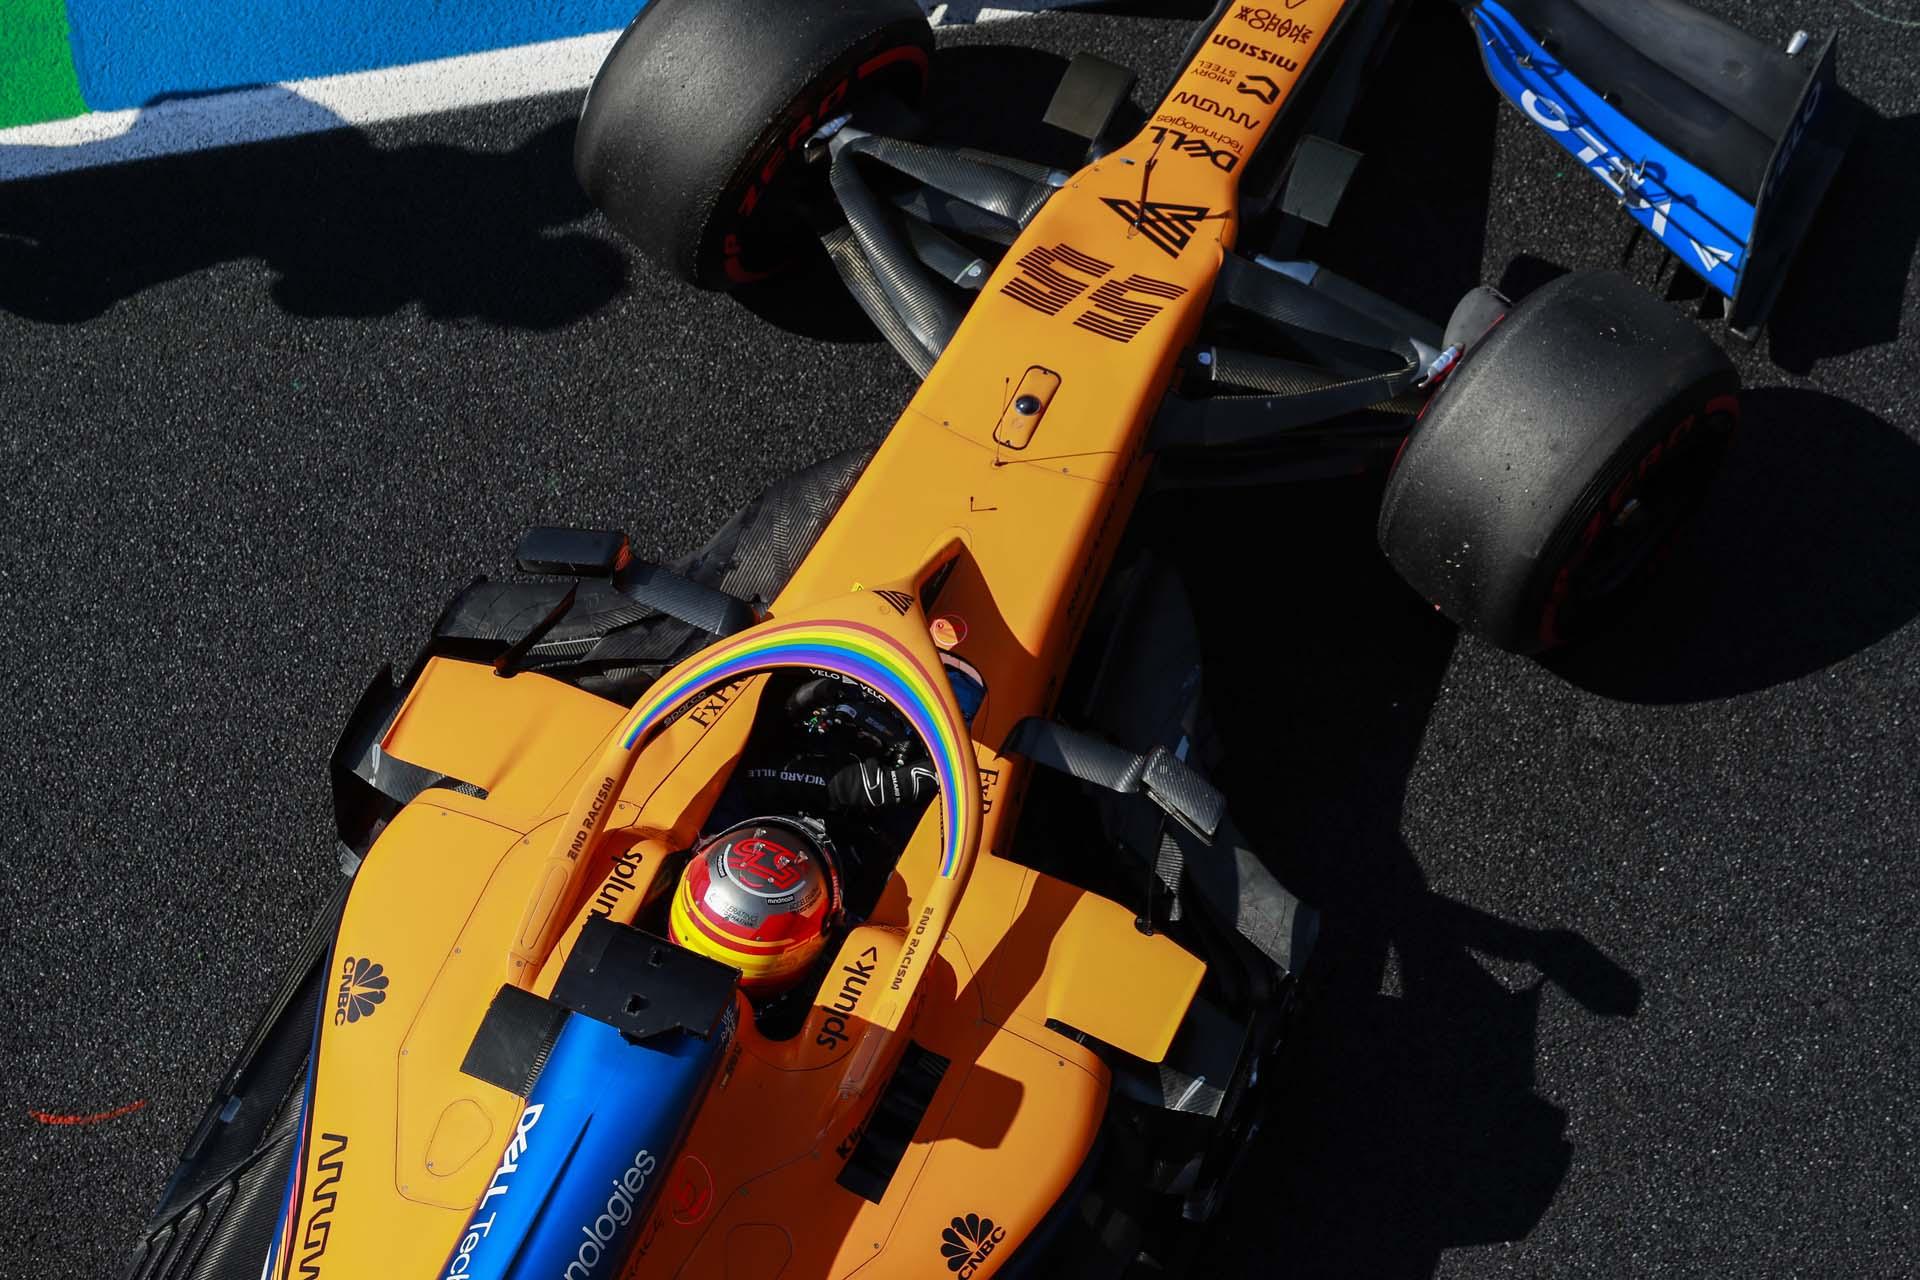 Carlos Sainz, McLaren MCL35, overhead view in the pit lane